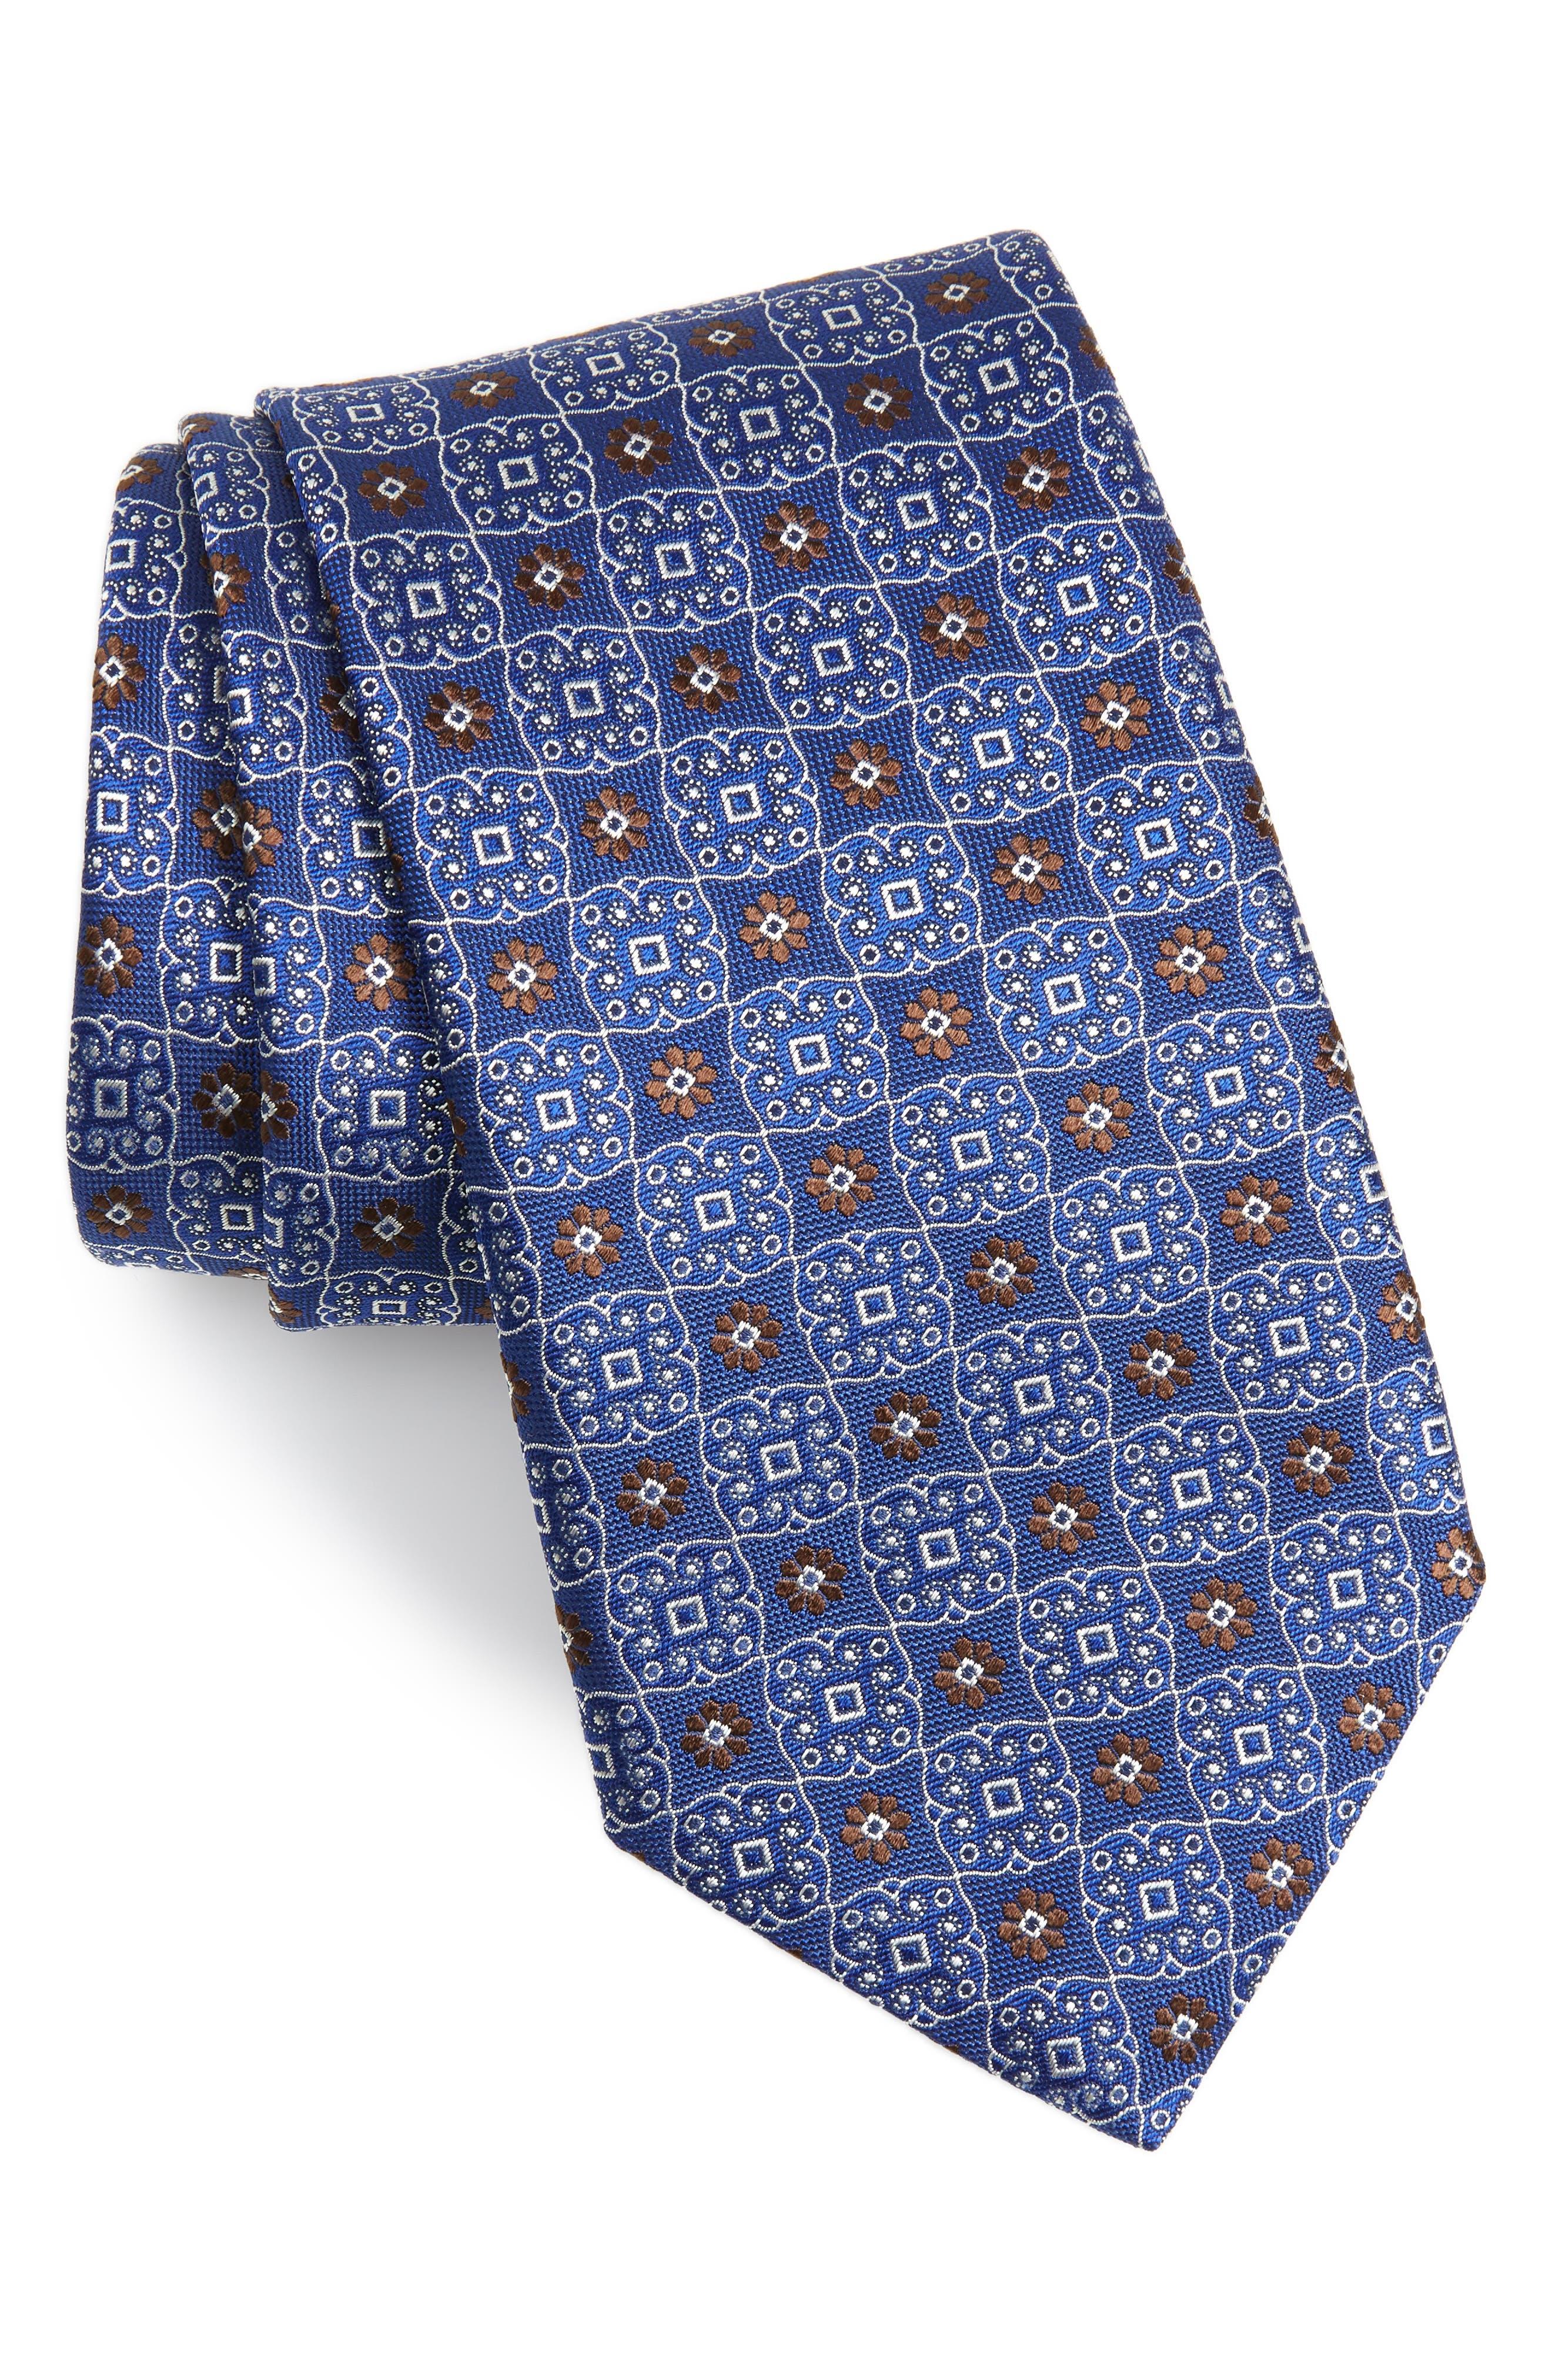 CANALI, Medallion Silk X-Long Tie, Main thumbnail 1, color, NAVY